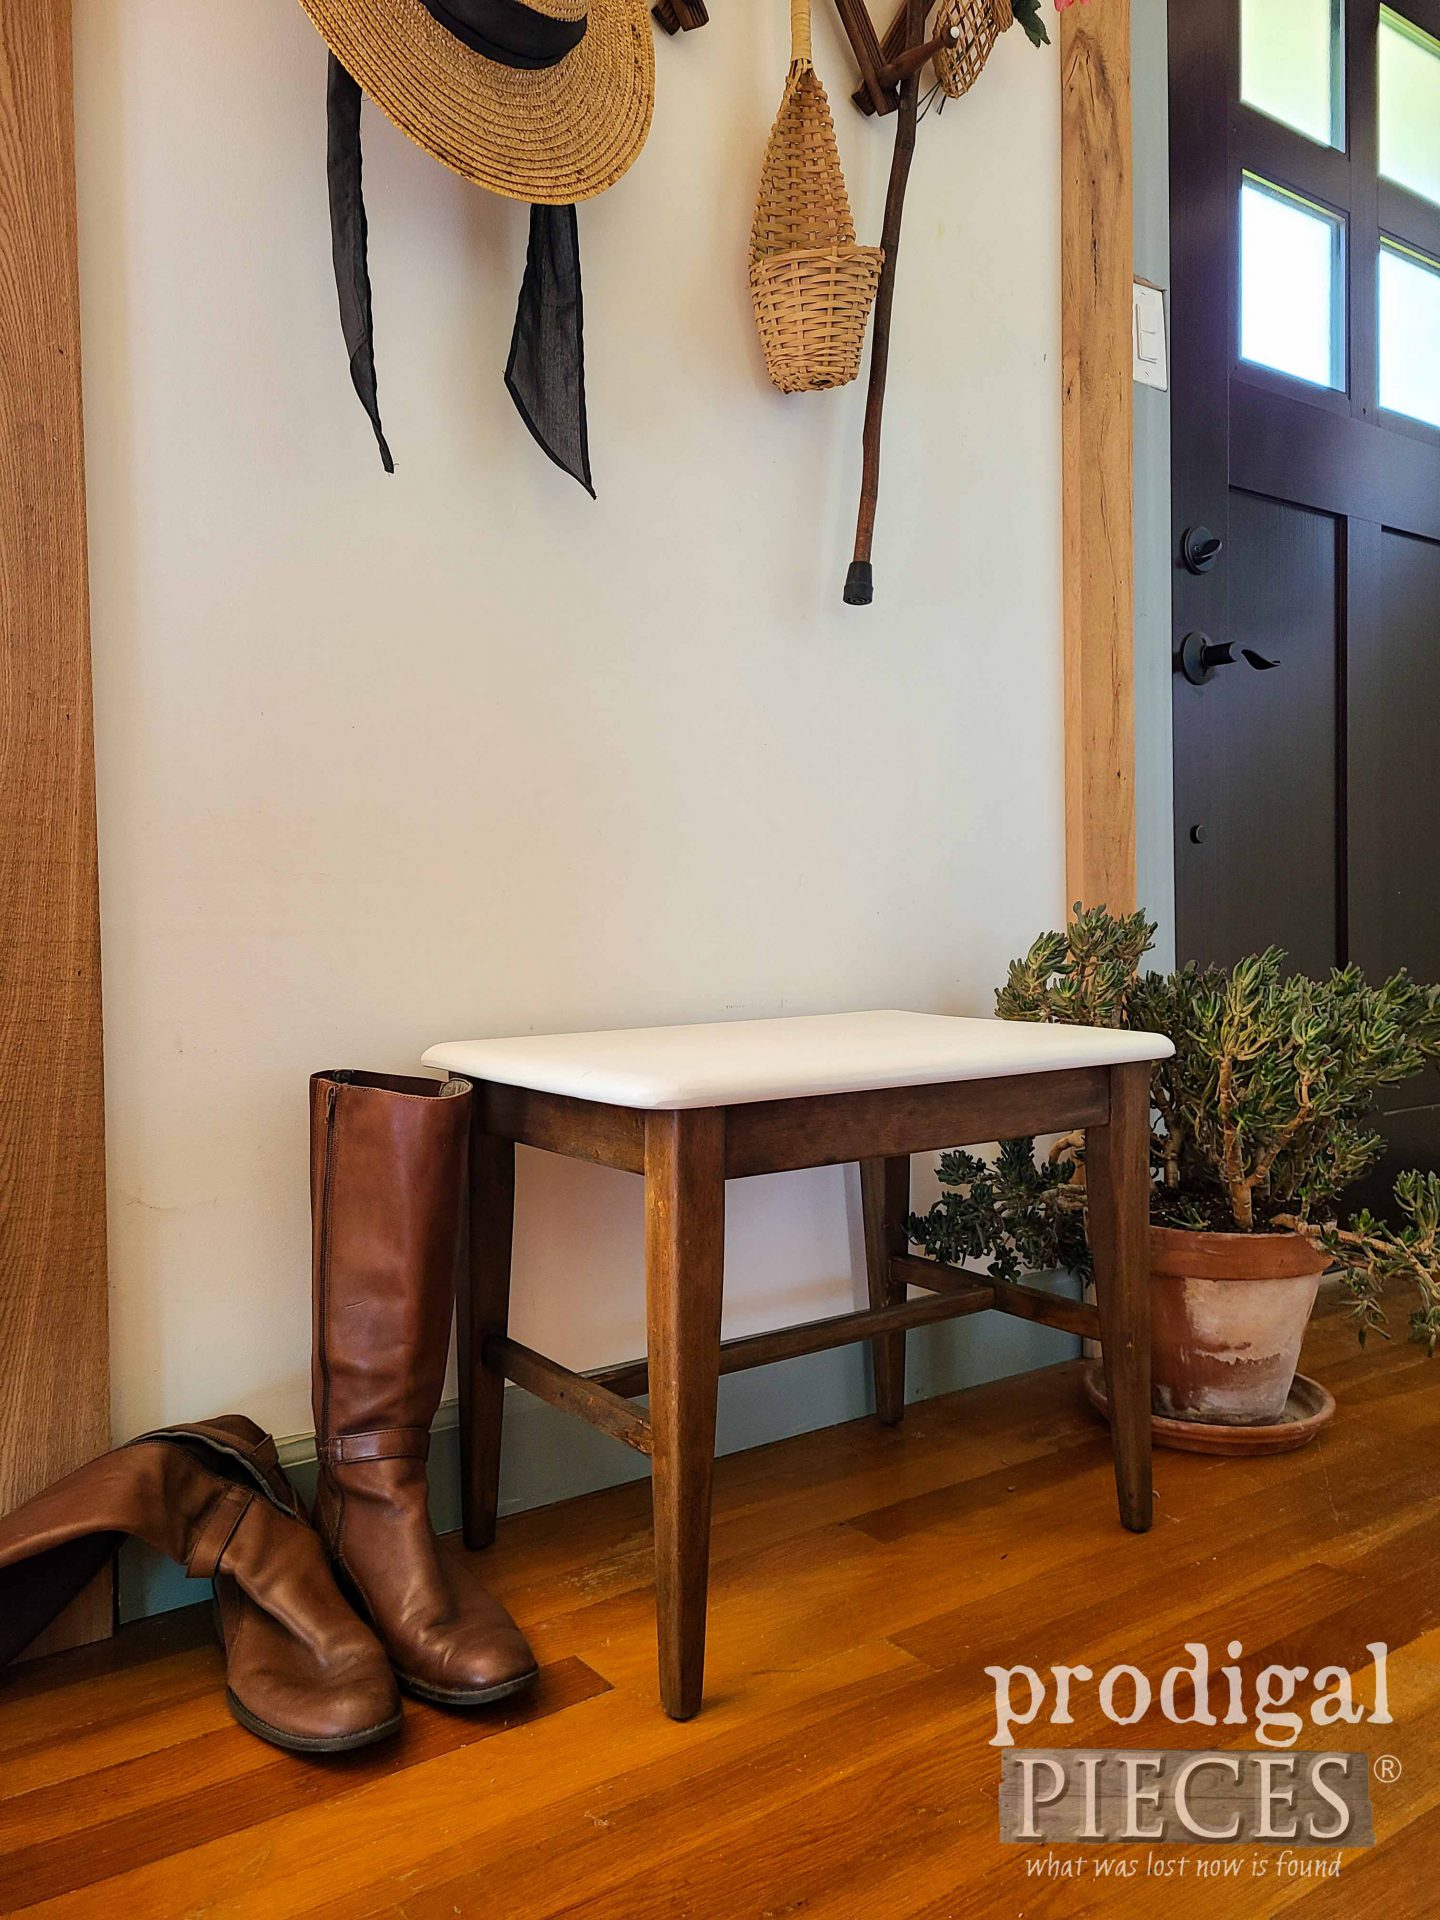 DIY Mid Century Modern Bench Seat by Larissa of Prodigal Pieces | prodigalpieces.com #prodigalpieces #midcentury #modern #diy